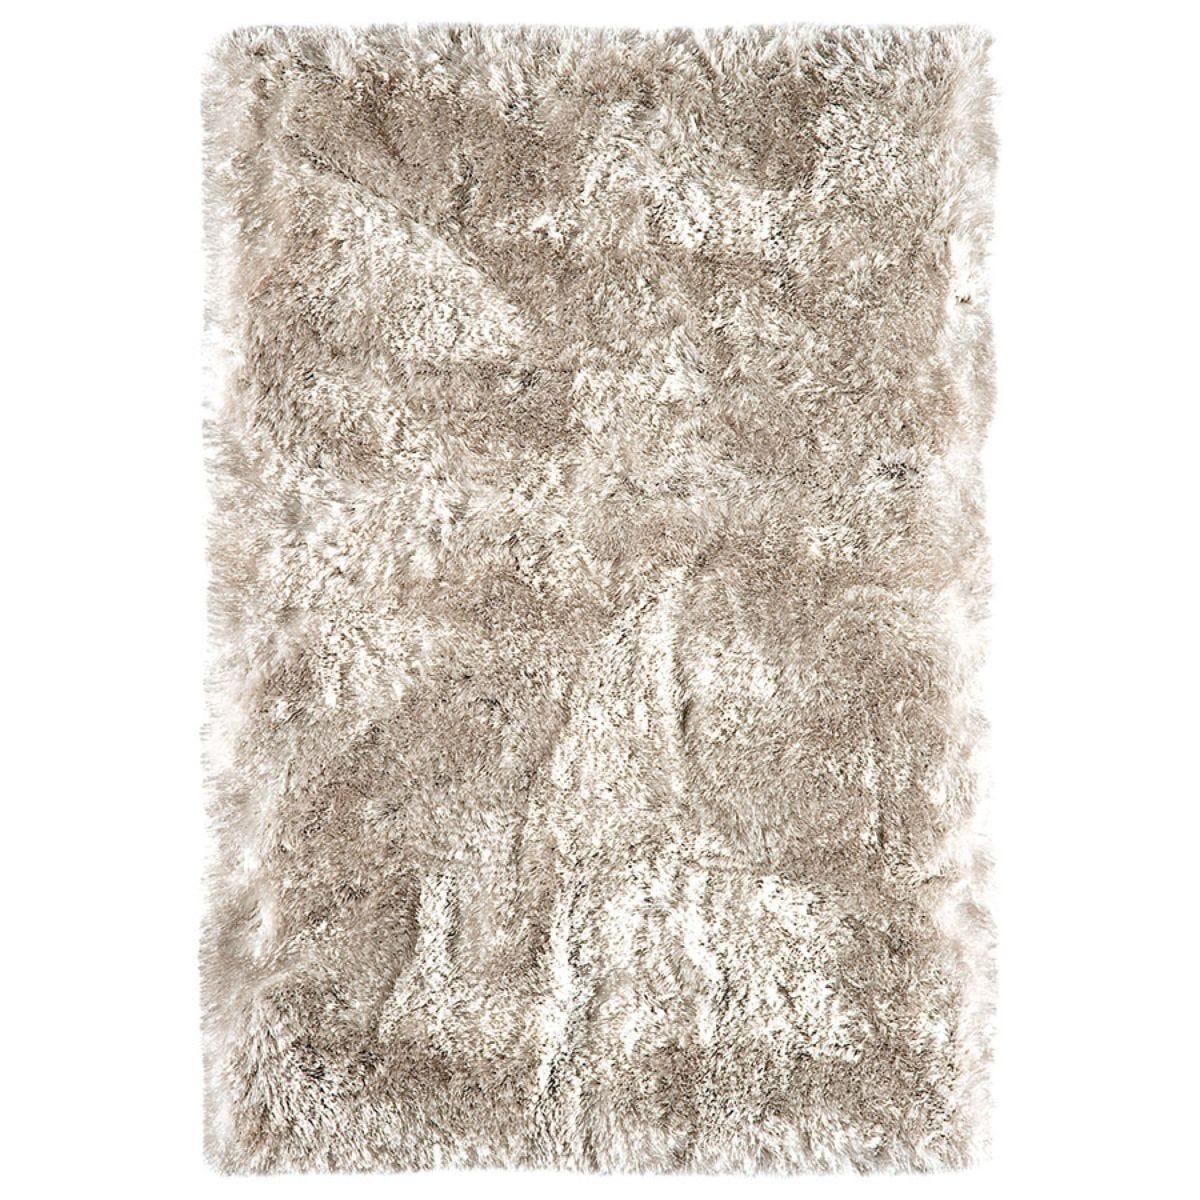 Asiatic Plush Shaggy Rug, 50 x 150cm - Sand